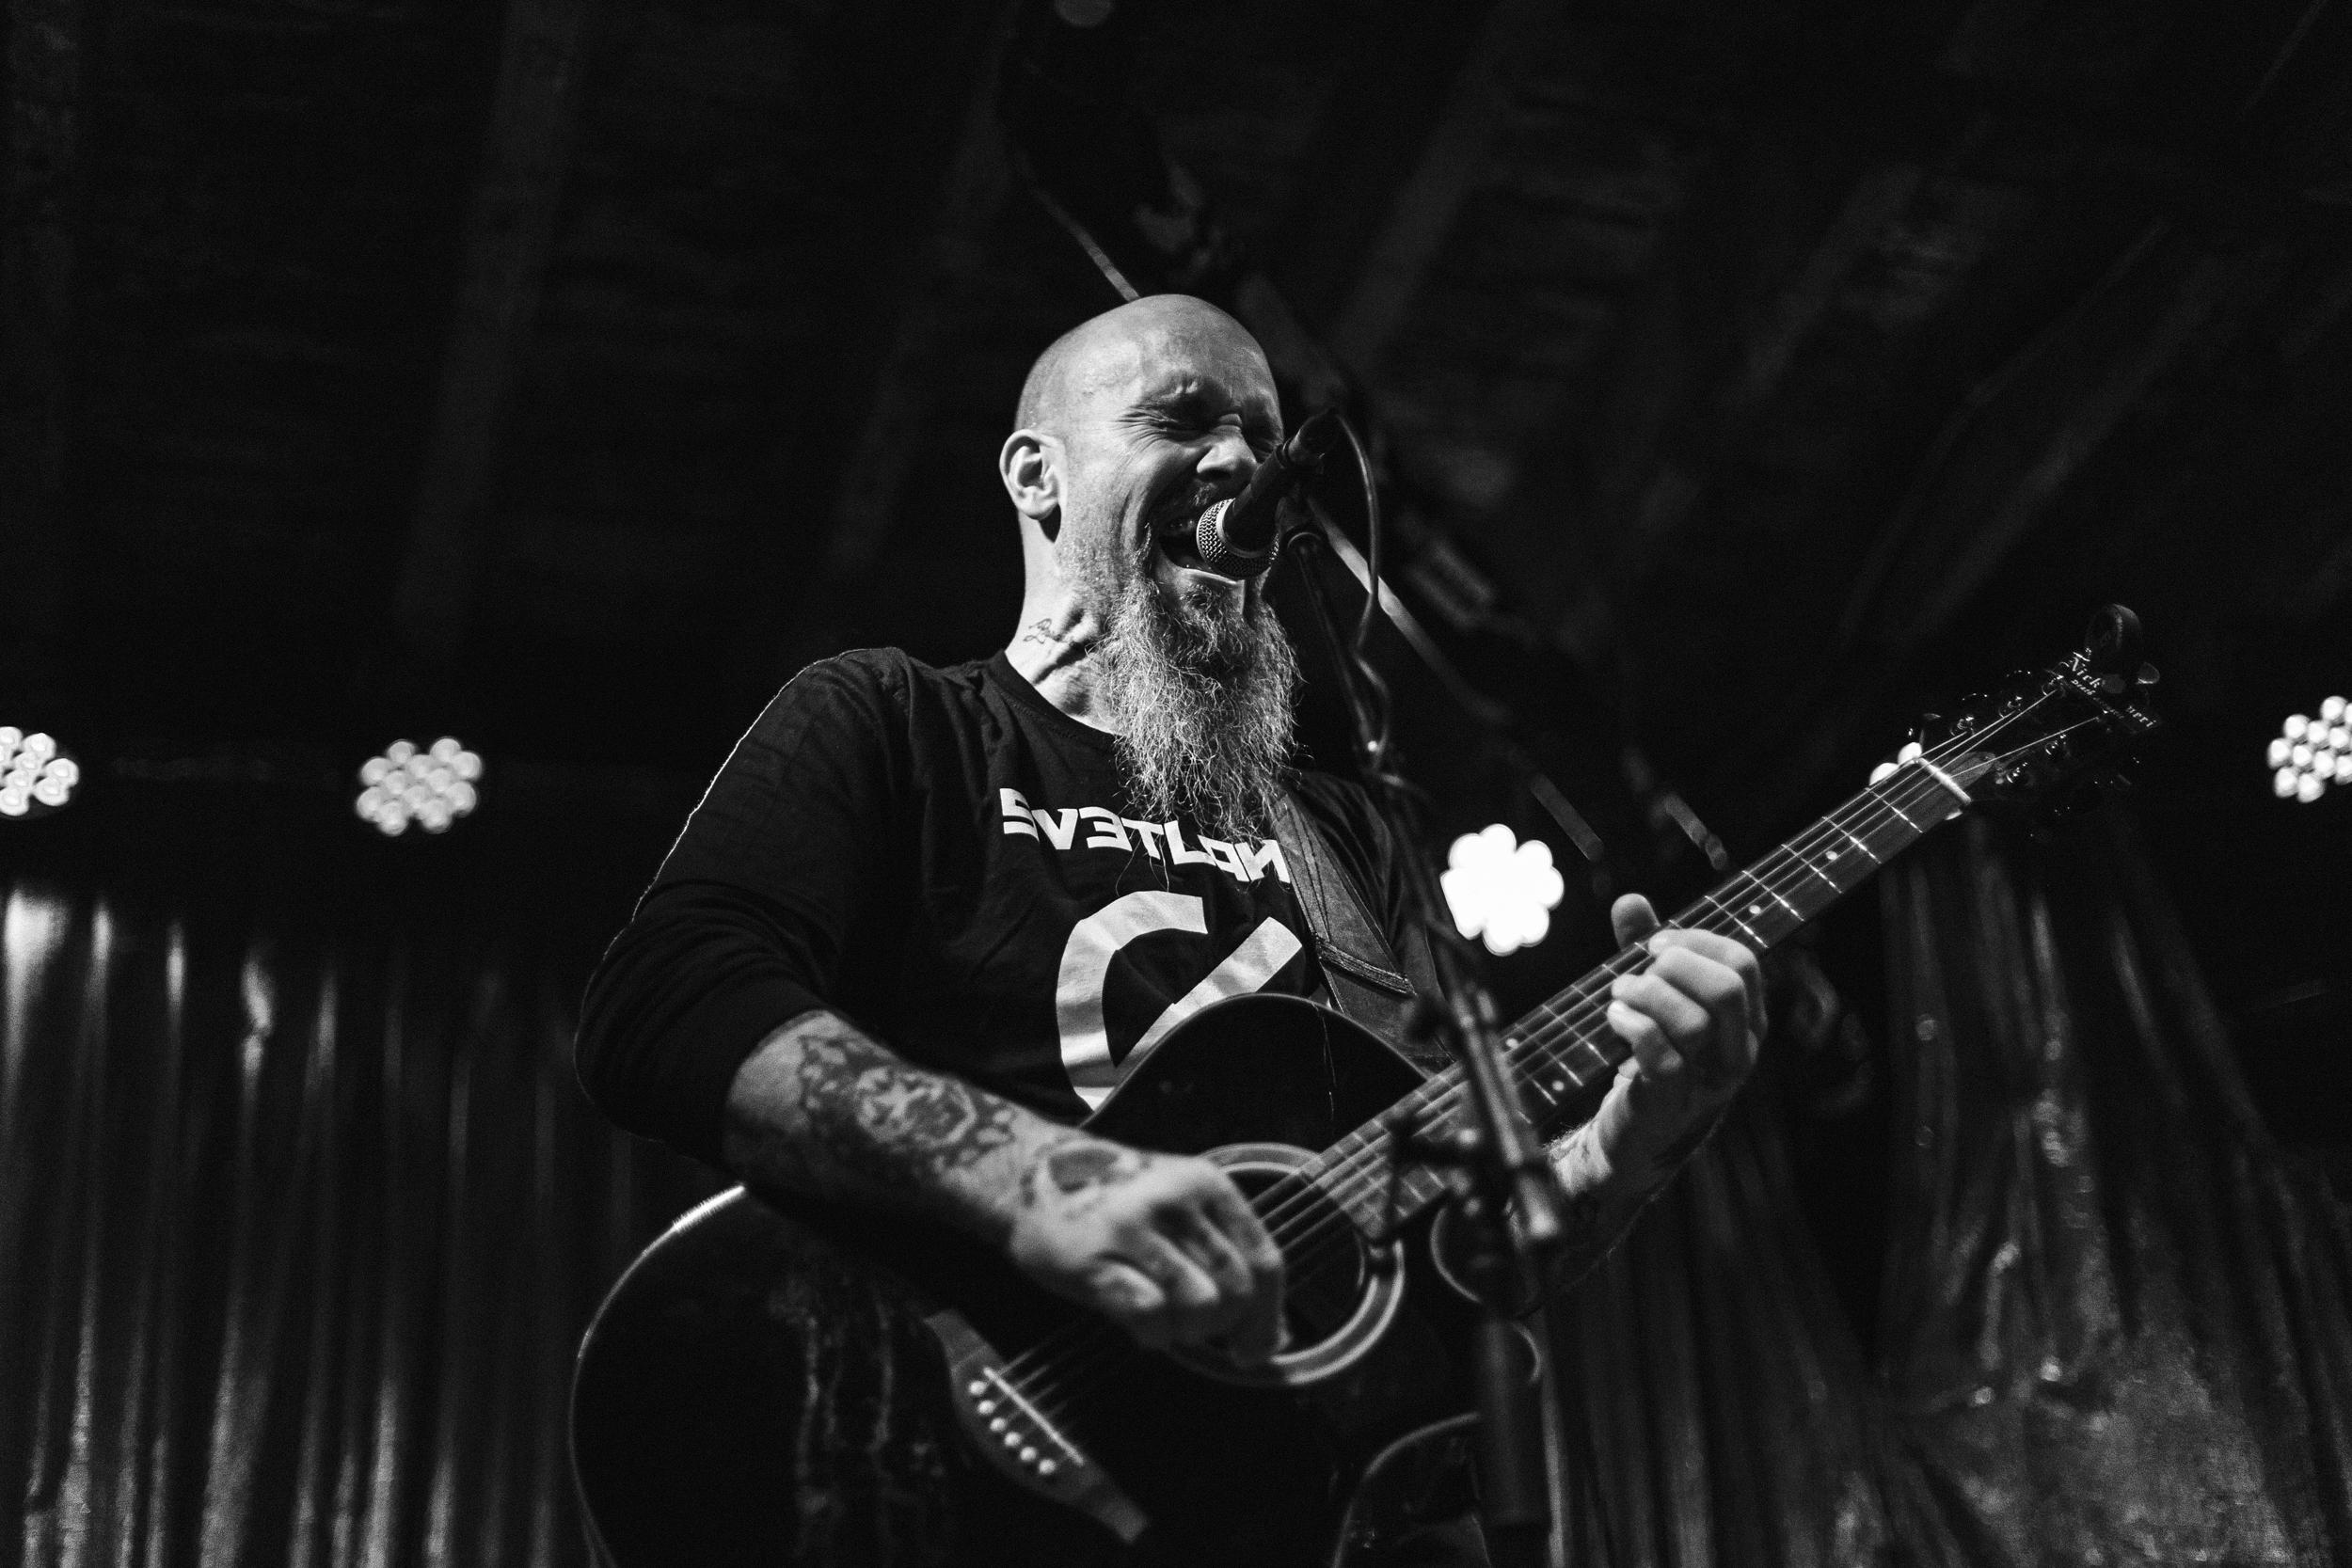 Nick O Acoustic_CherryBar-4870.jpg